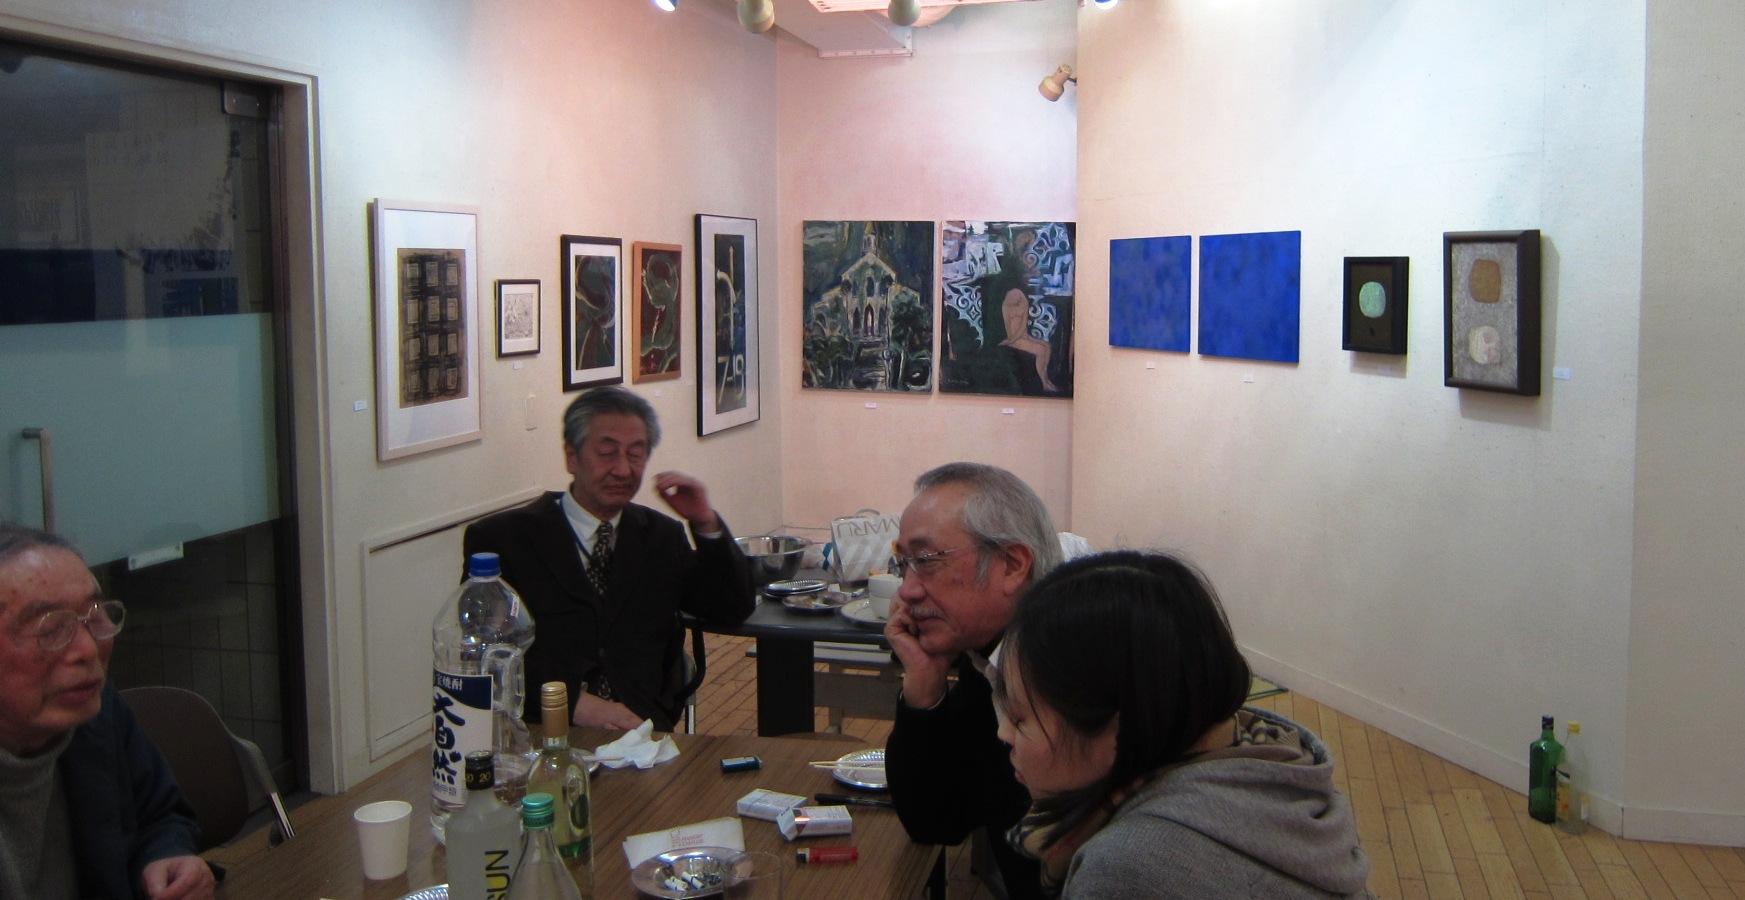 2354) 「LA`TAPIO -Ⅱ- Exhibition」 たぴお 1月27日(月)~2月15日(土)_f0126829_9211122.jpg